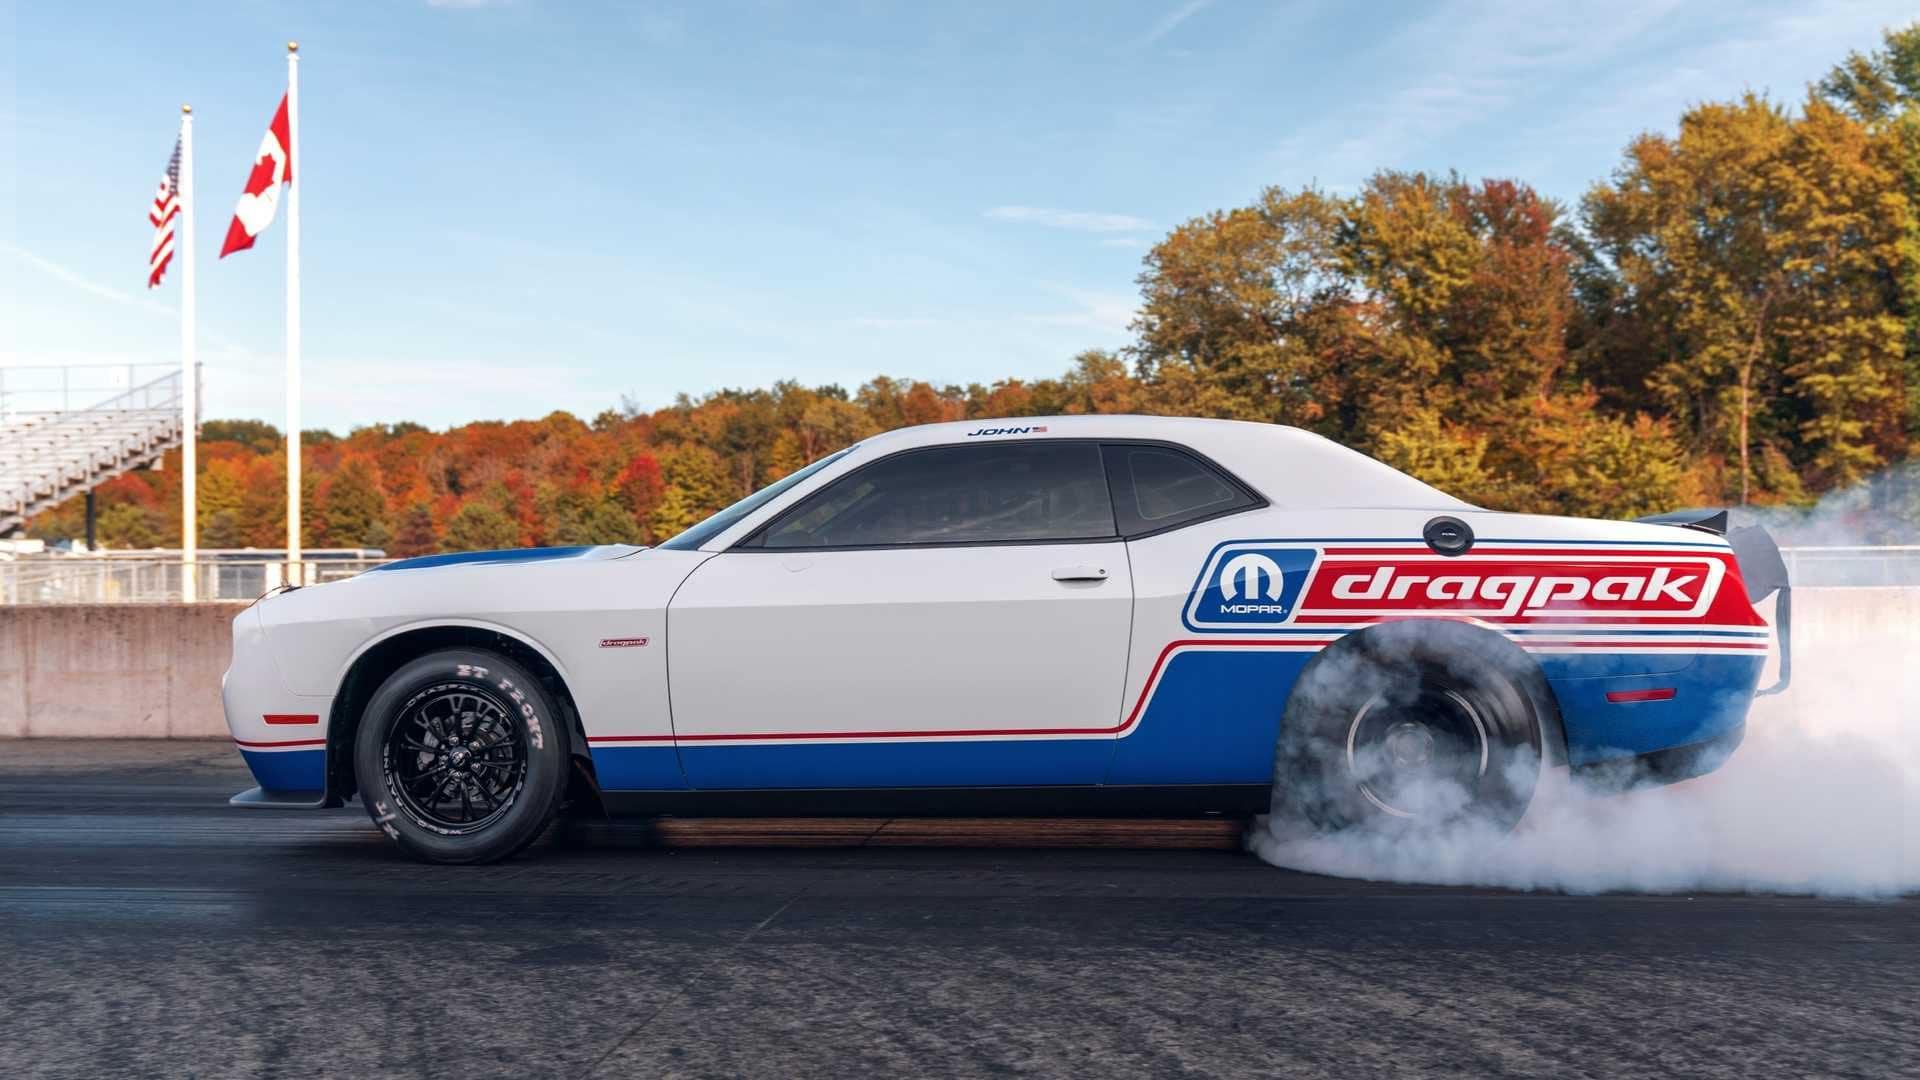 Dodge Announces 2020 Dodge Challenger Drag Pak At 2019 Sema